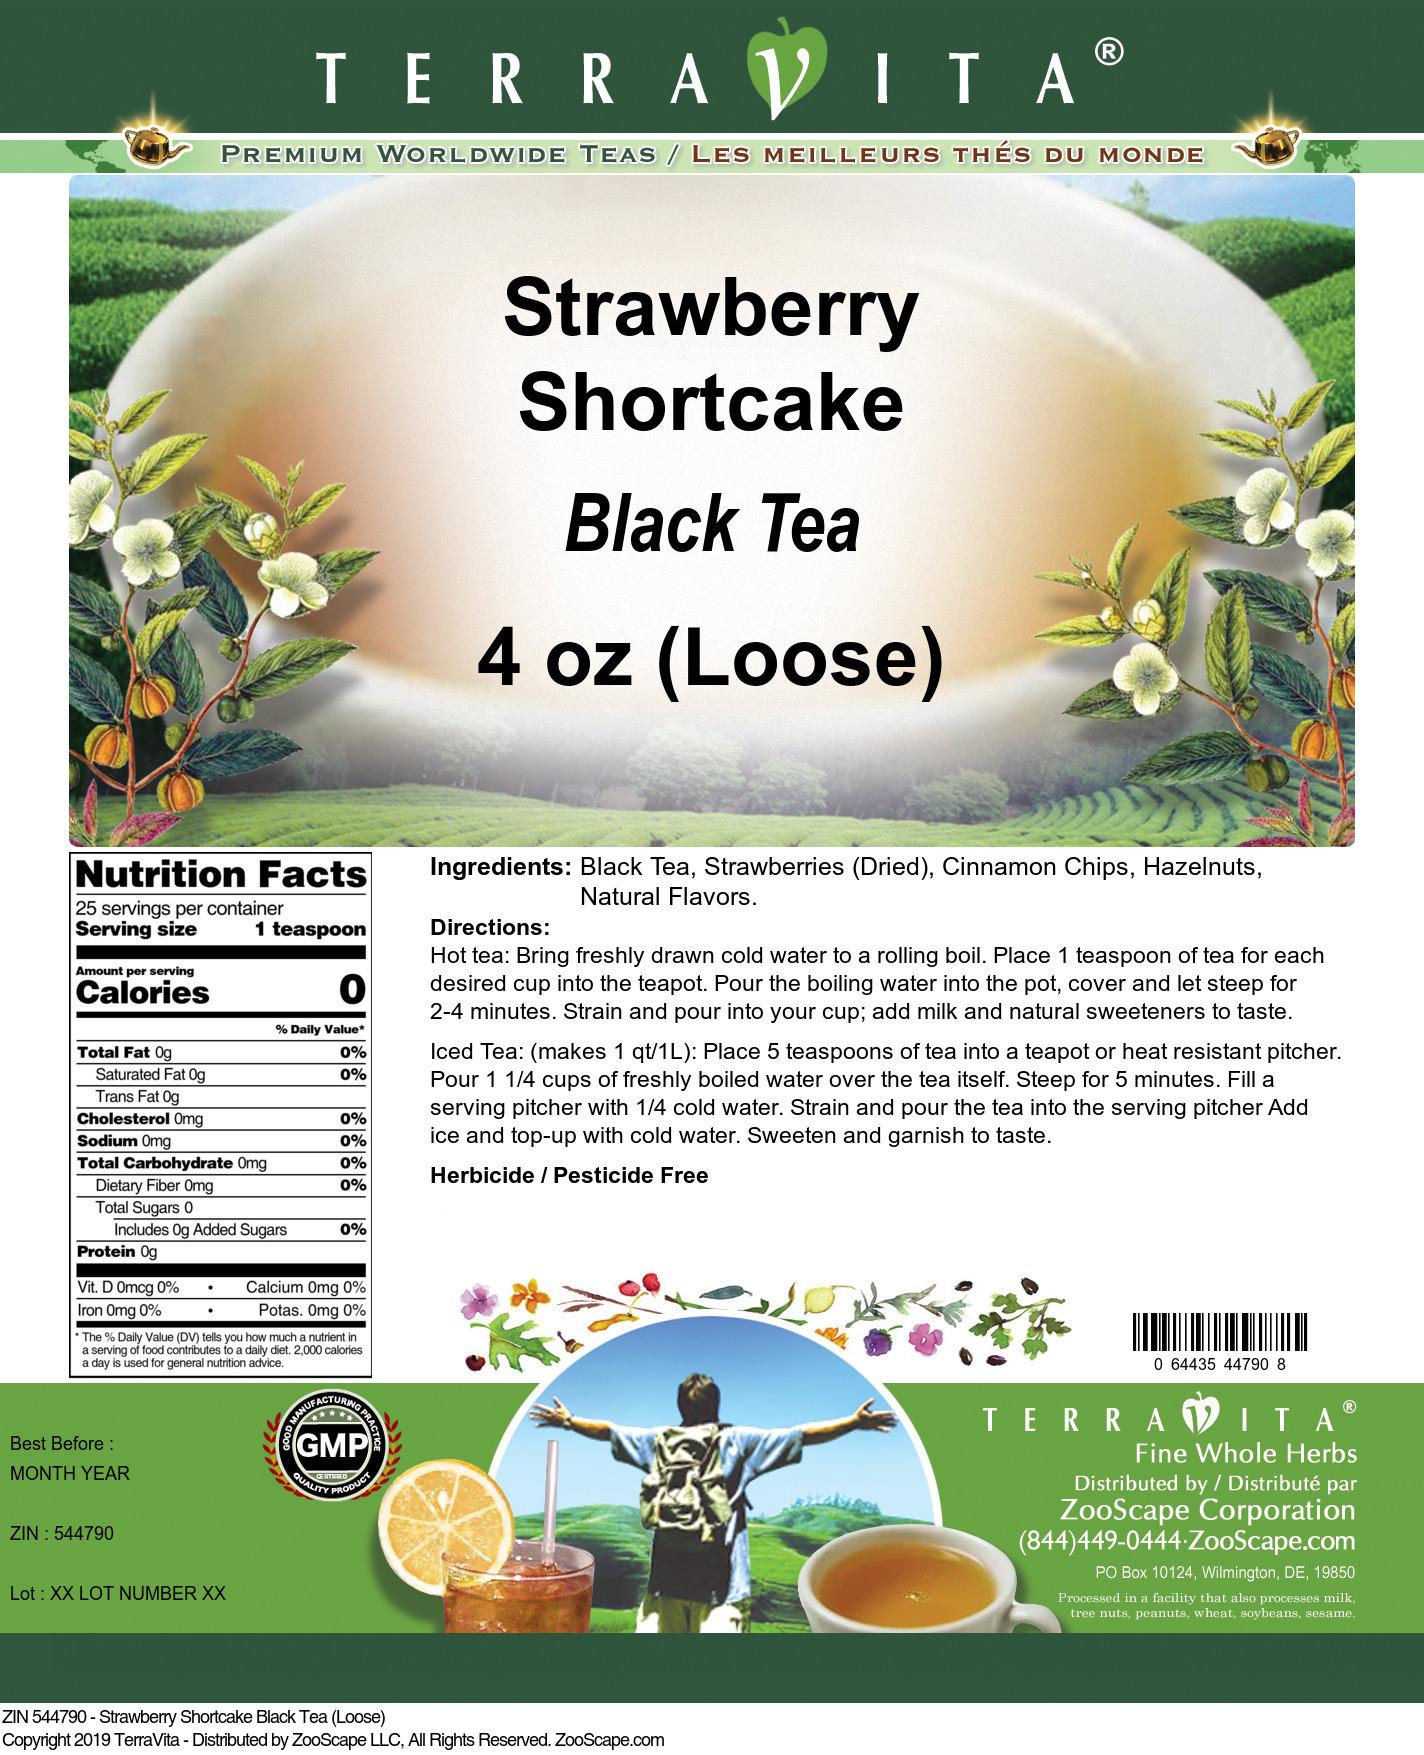 Strawberry Shortcake Black Tea (Loose)